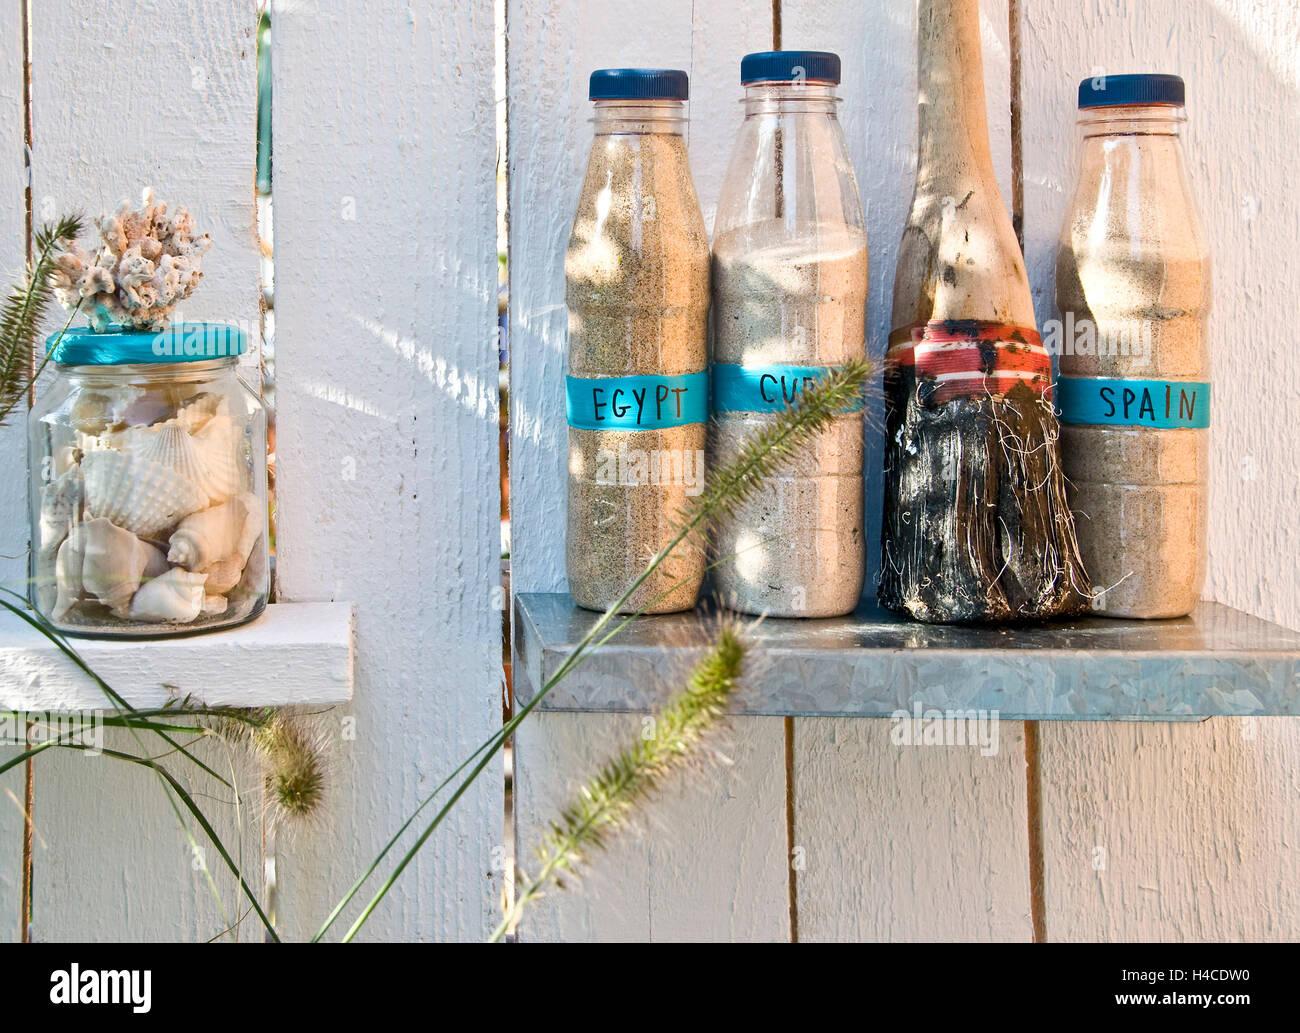 Shelves, bottles of Sand and flotsam and jetsam - Stock Image